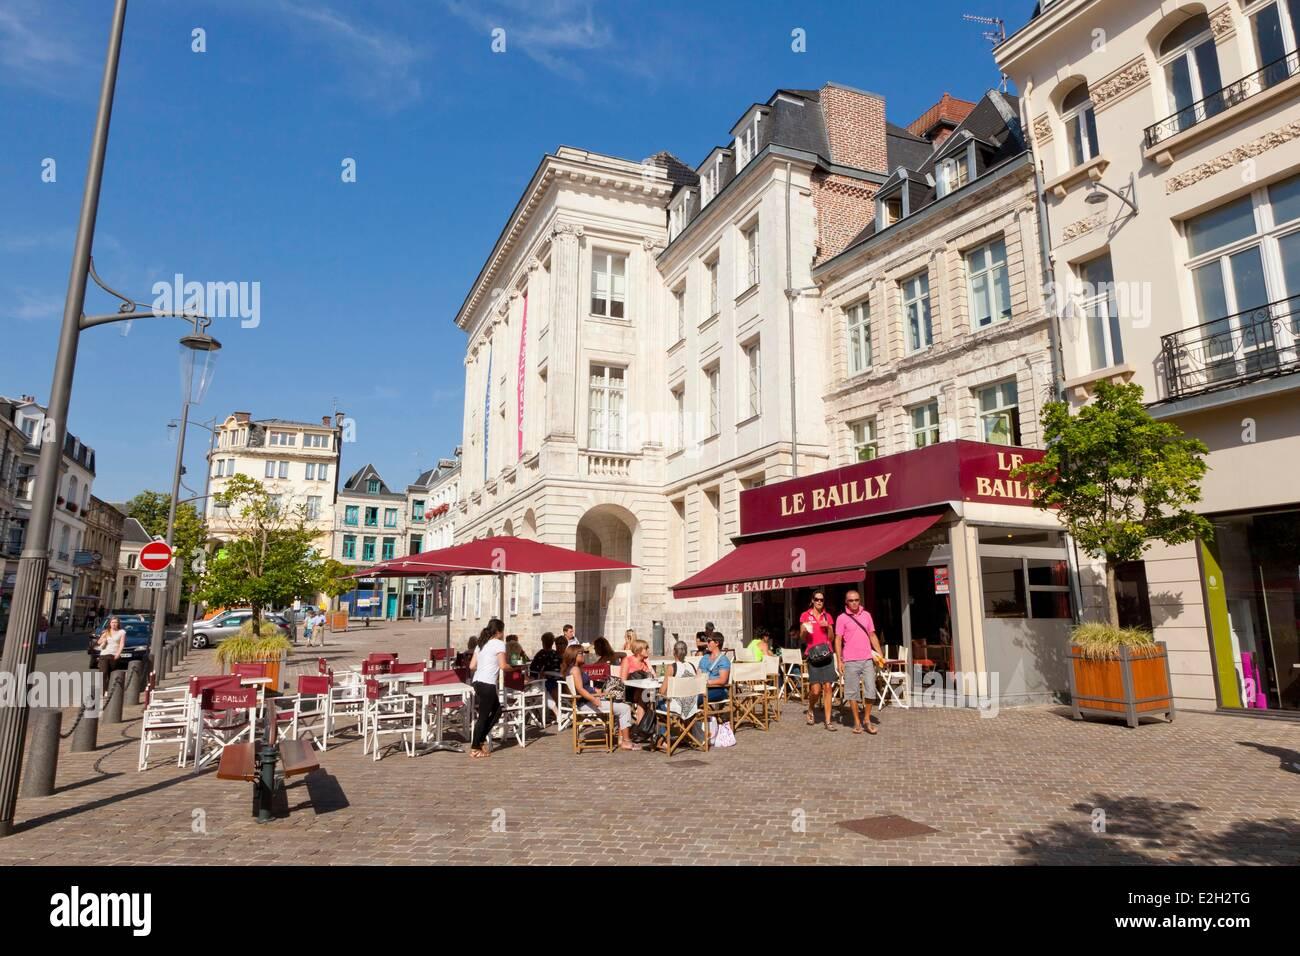 France Pas de Calais Arras Theatre of Arras and cafe terraces - Stock Image